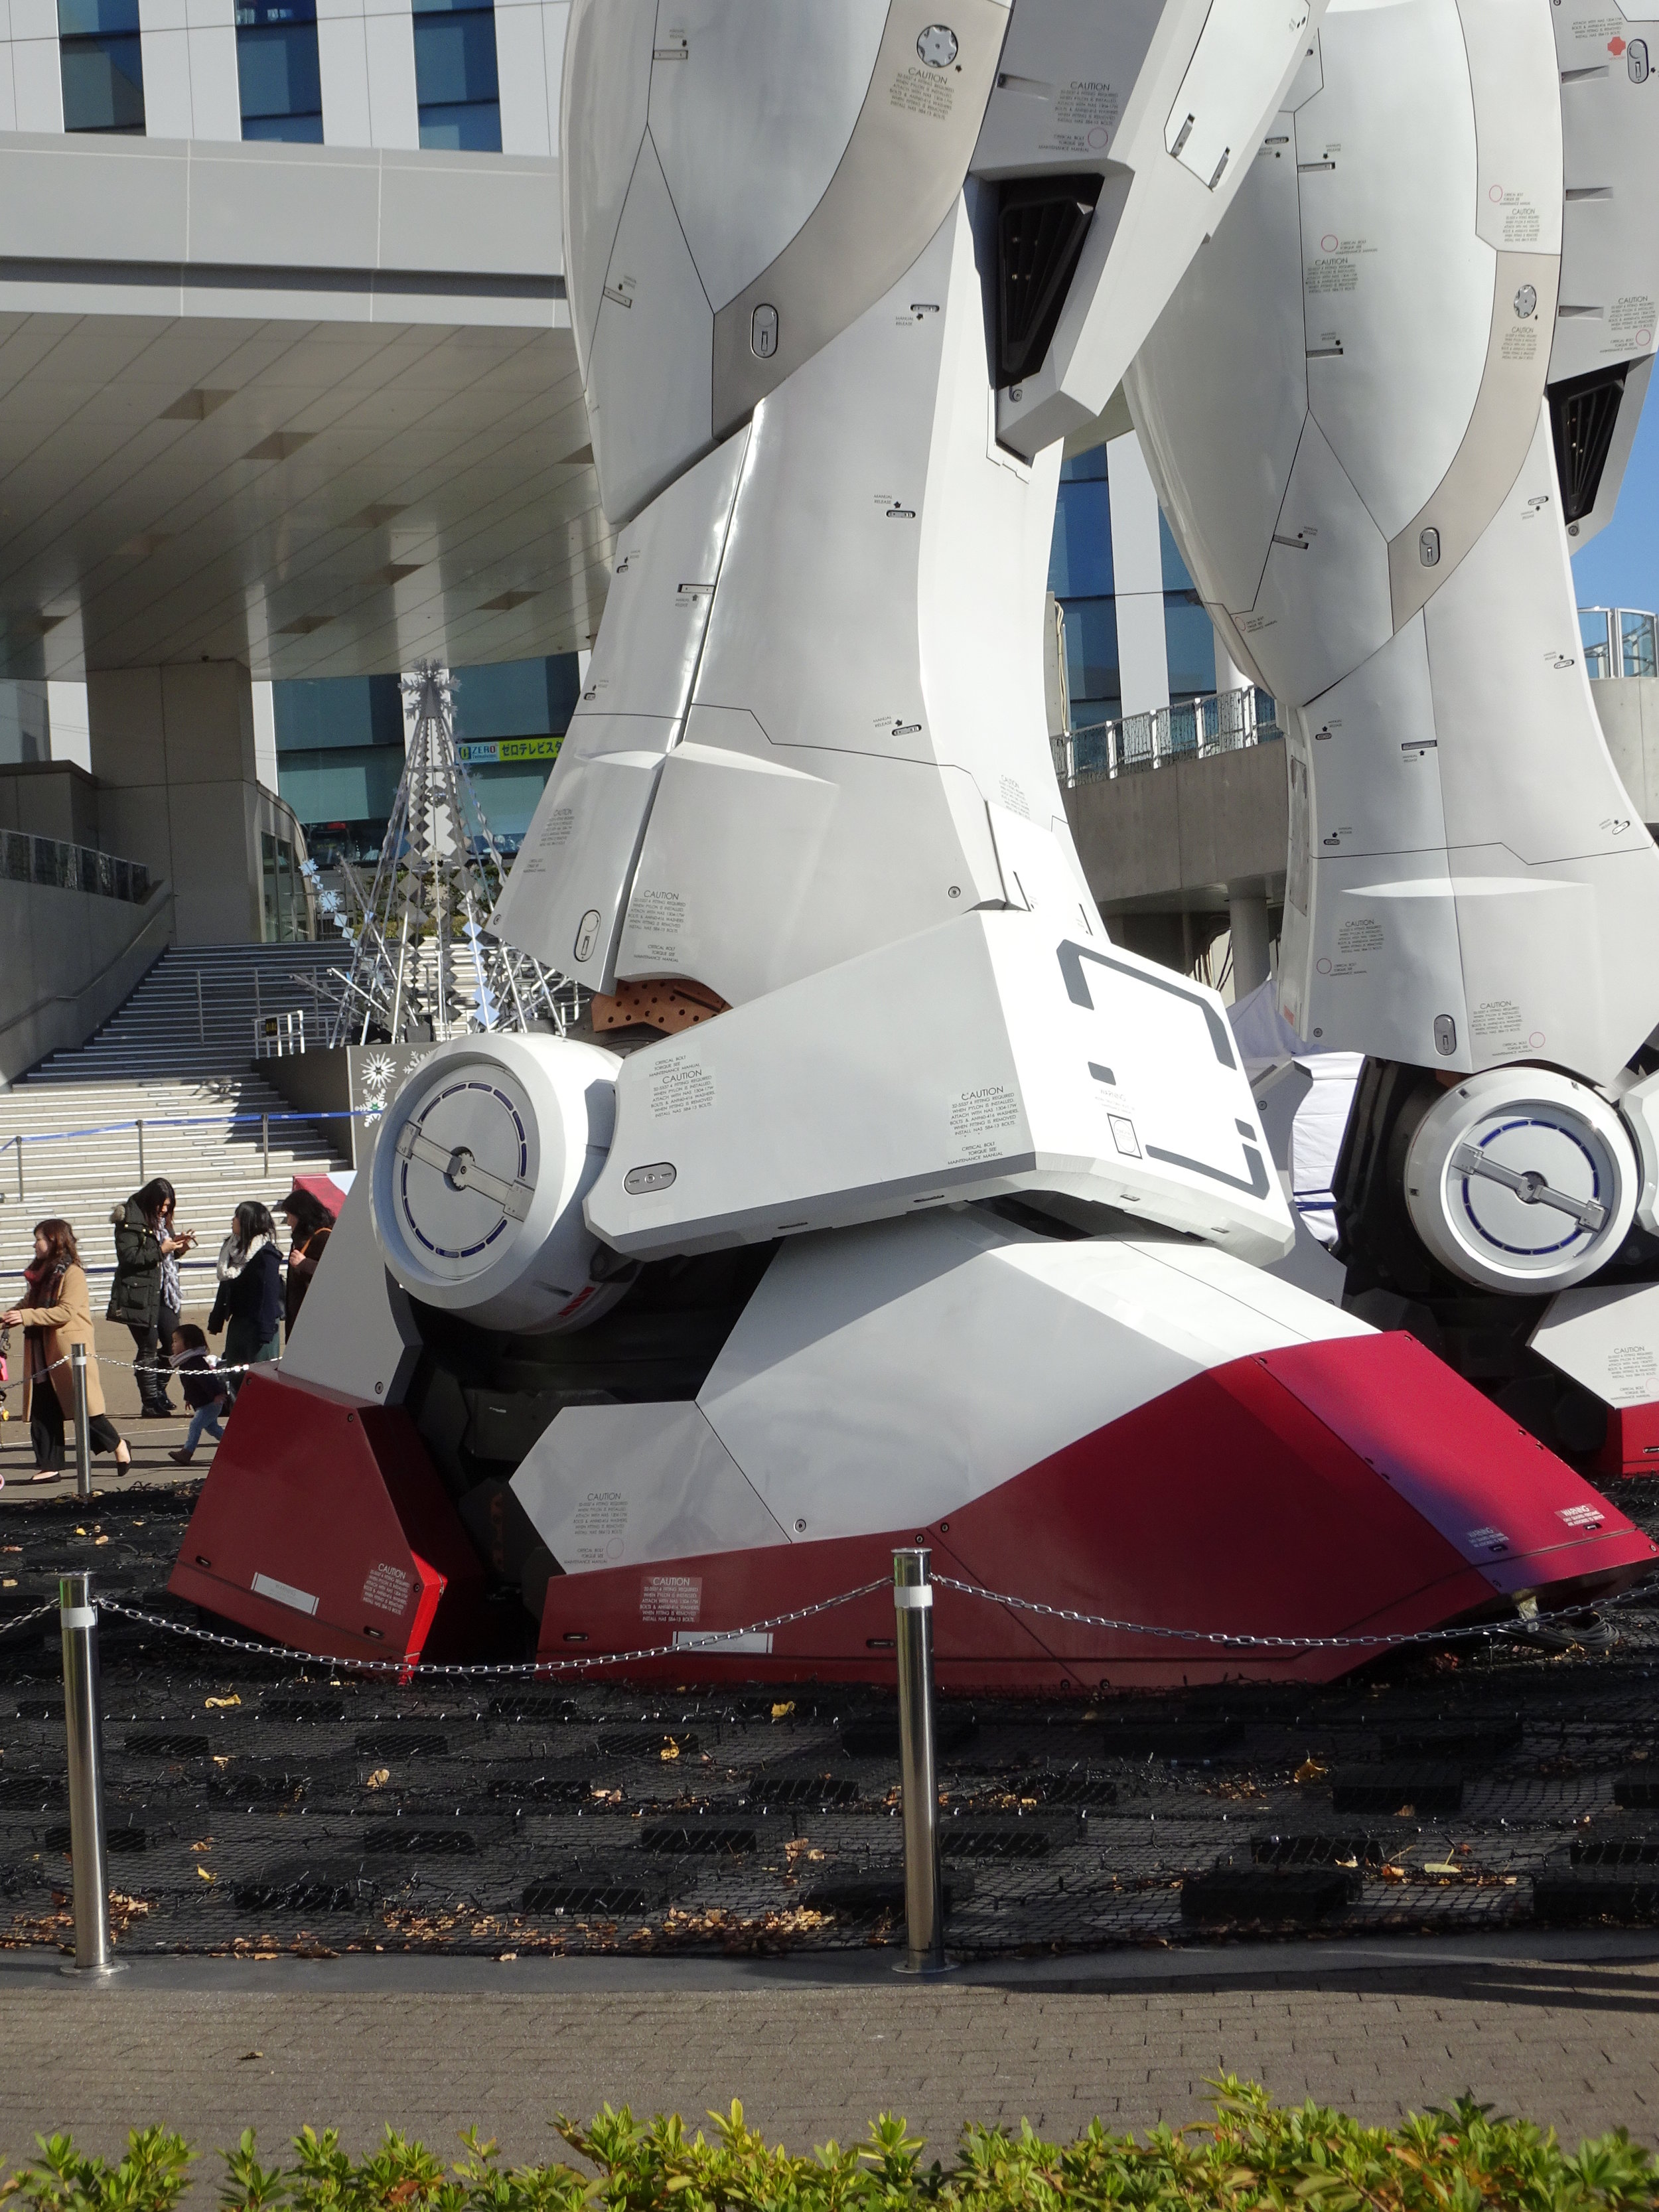 RX-78-2 Gundam 1-1 Statue - 025.jpg